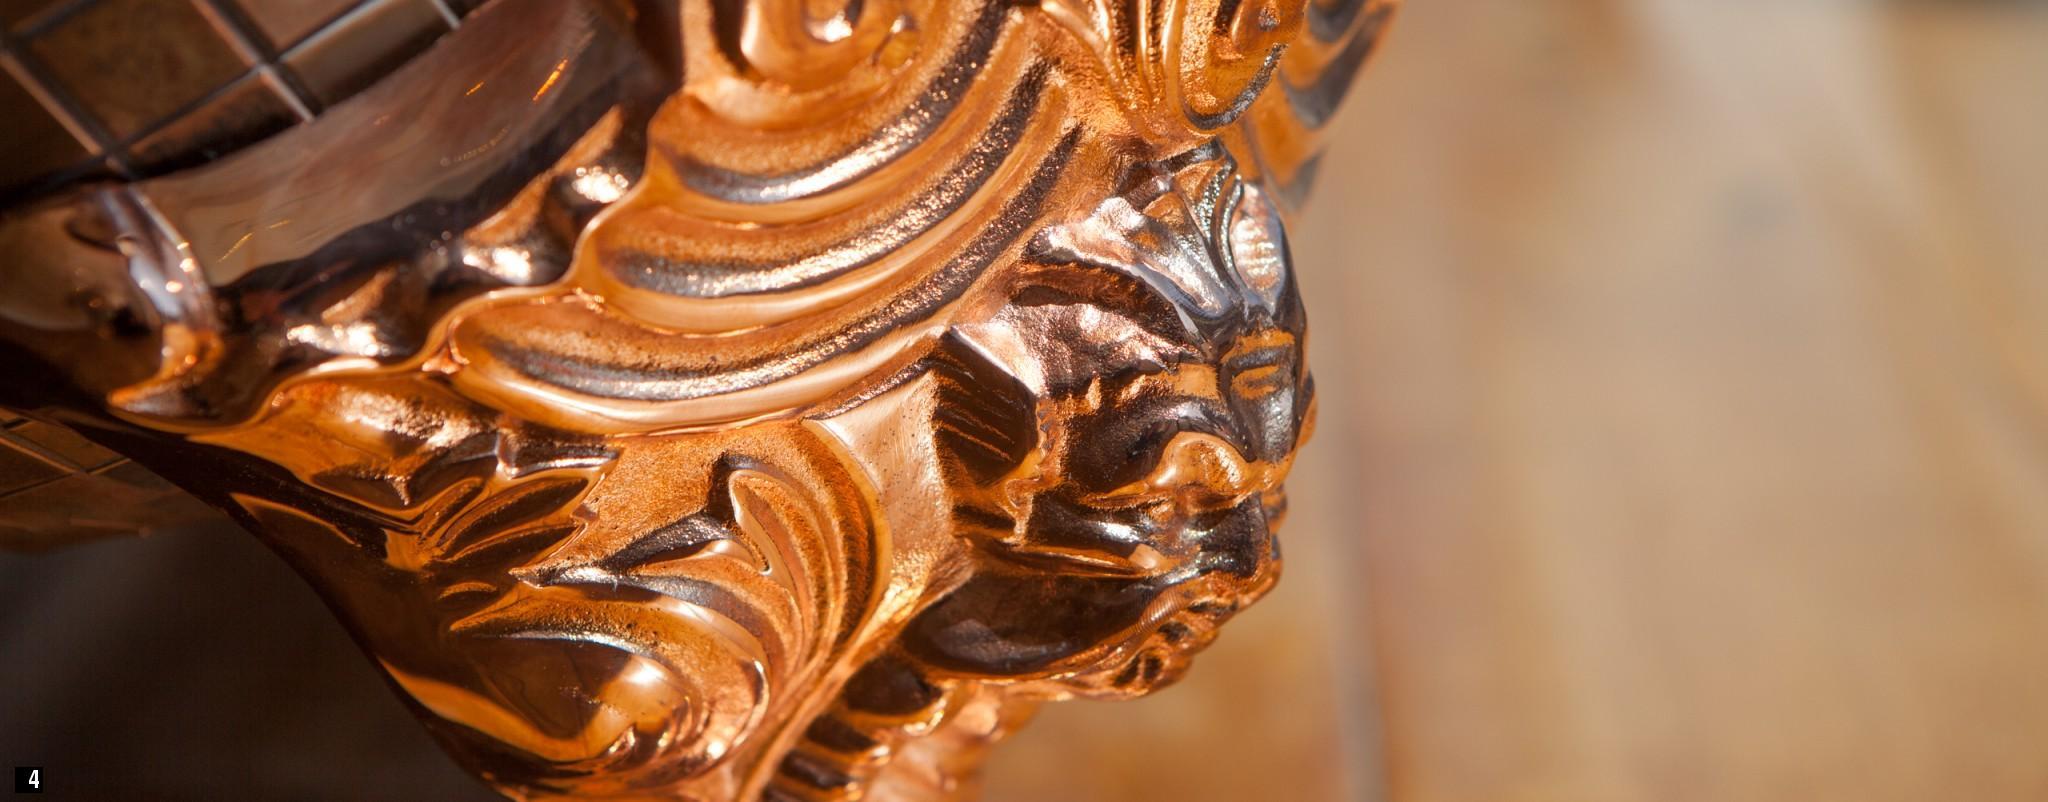 Chadder bath ornate leg detail